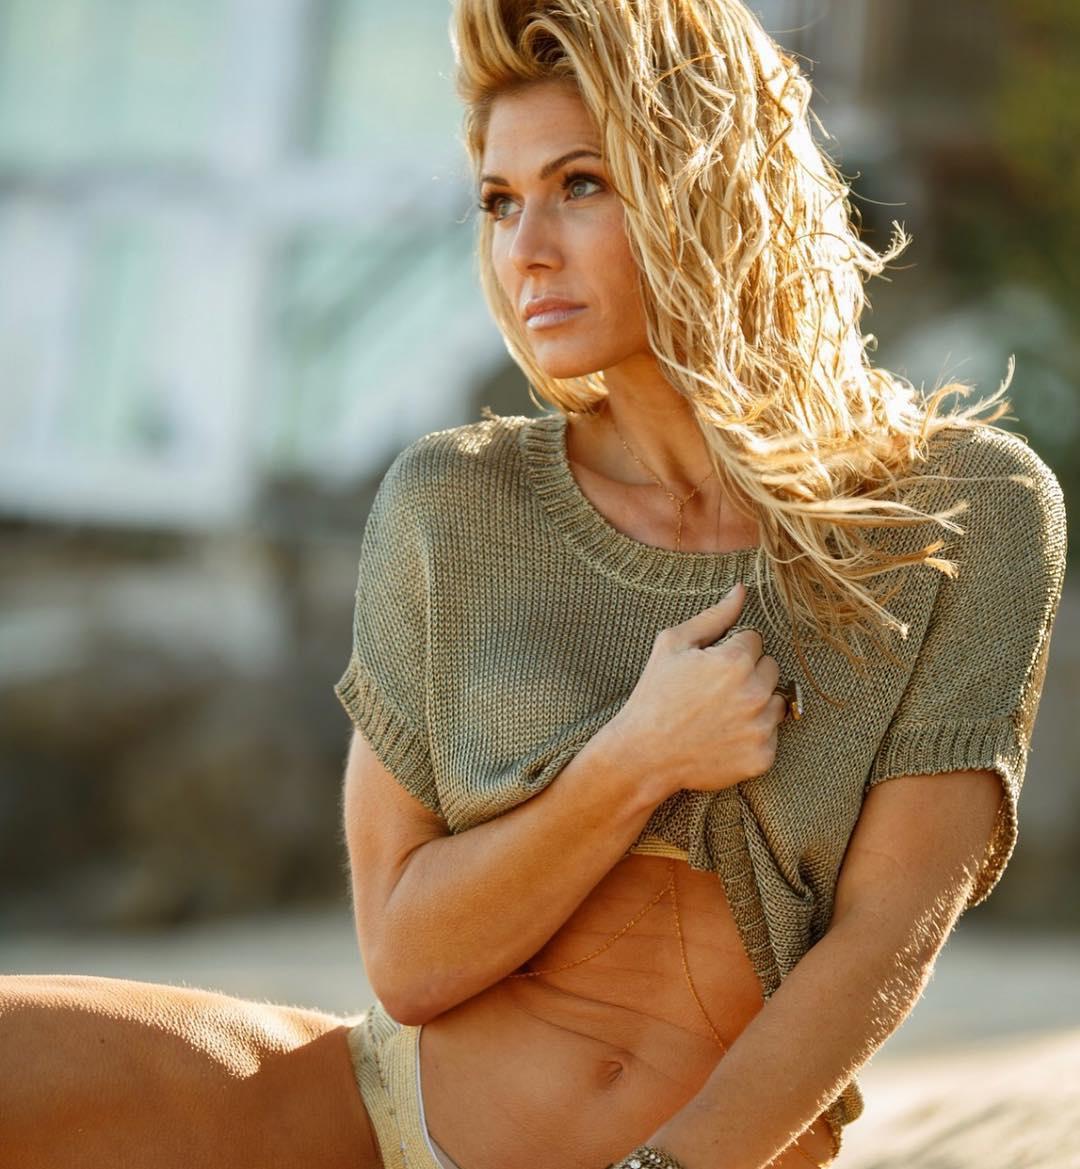 Torrie Wilson Provides a Valuable Coronavirus PSA in an Extremely Skimpy Bikini - Sports Gossip